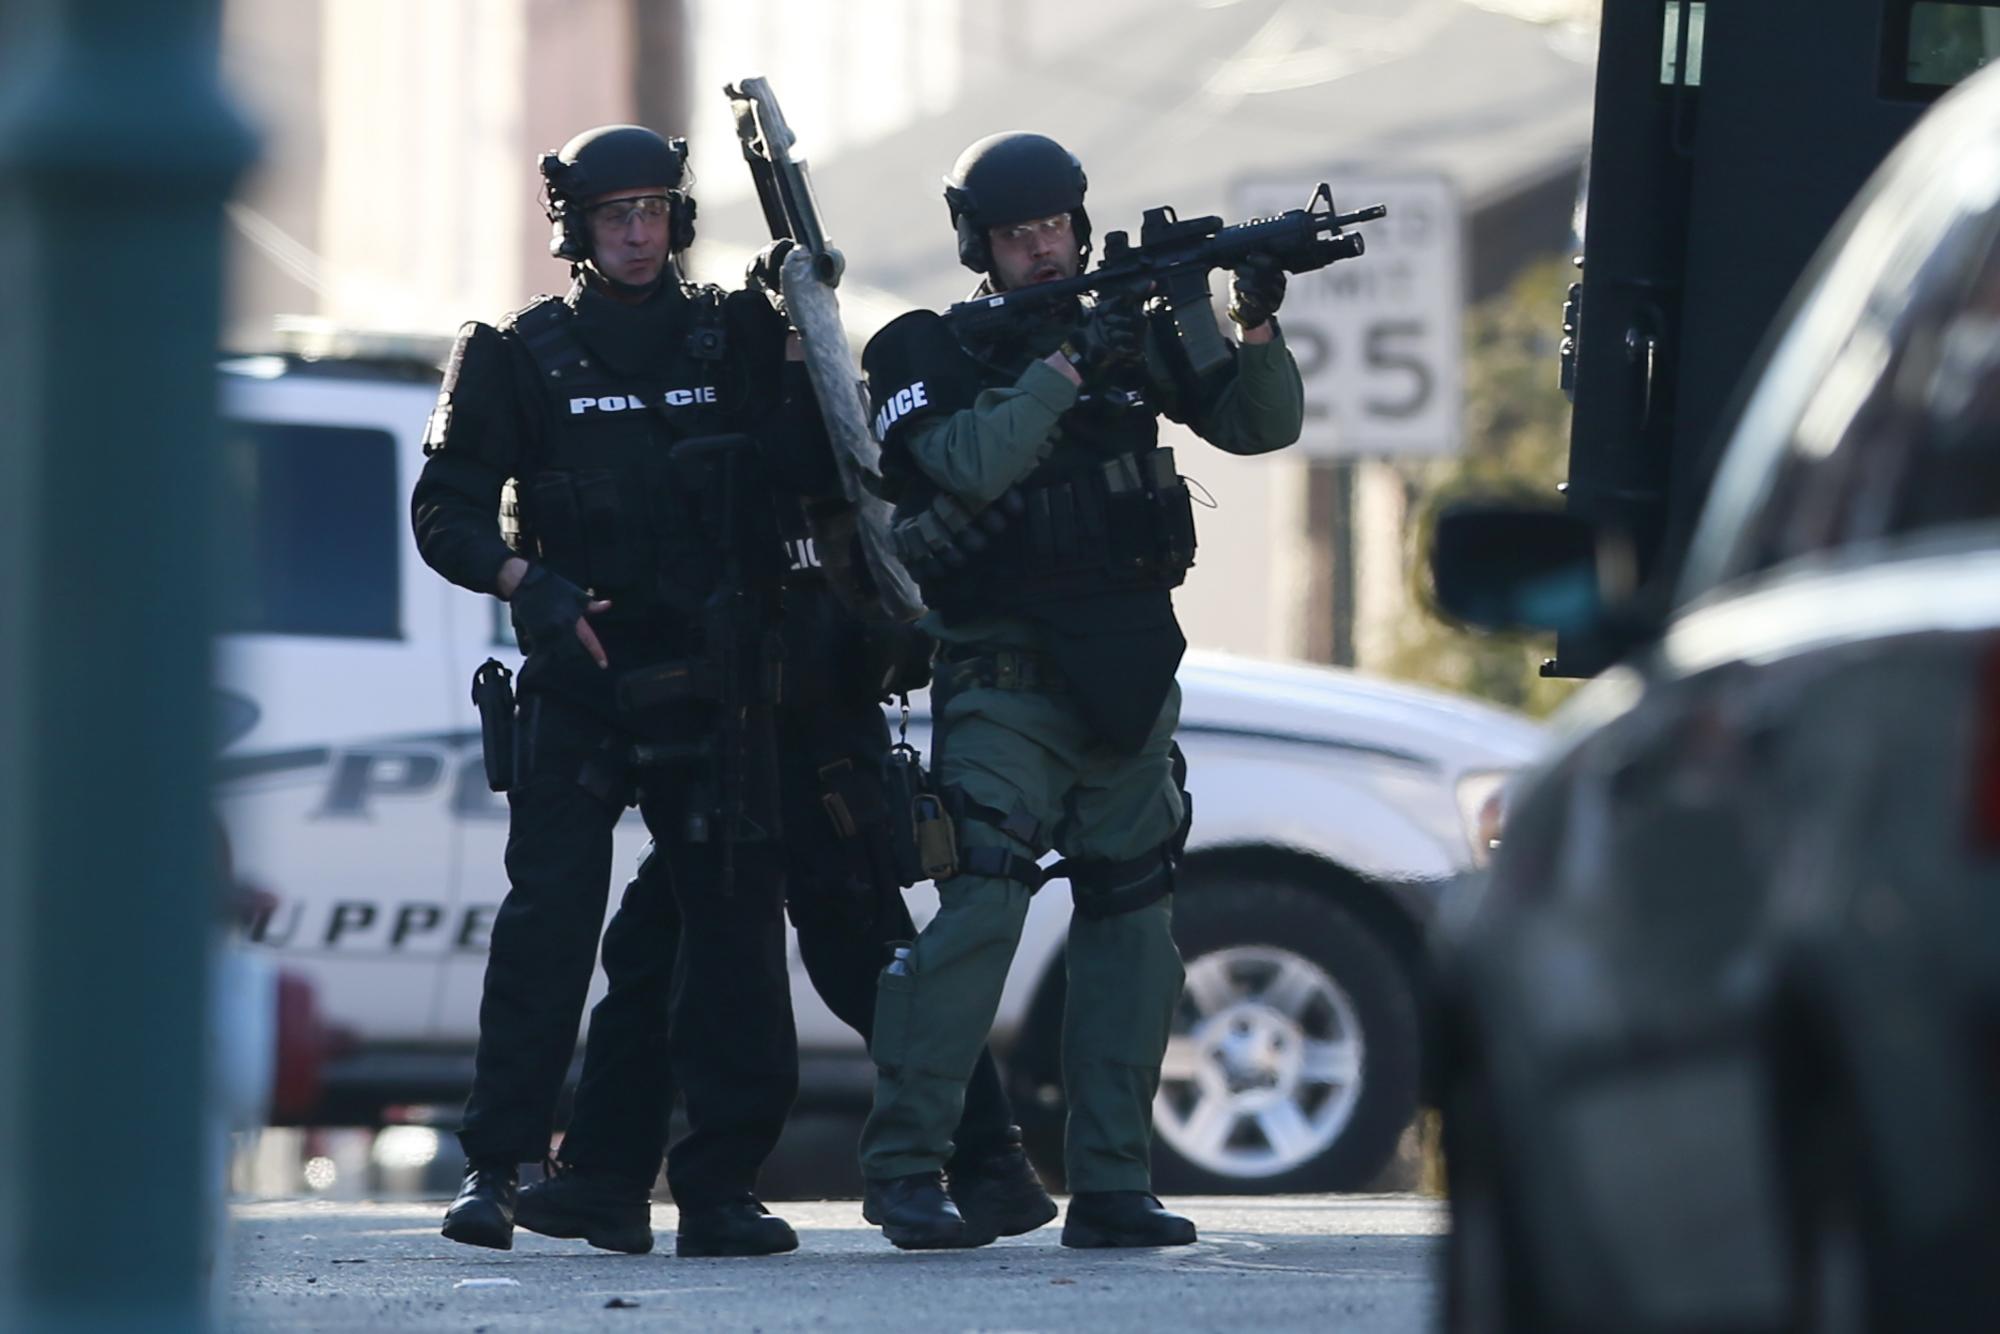 Suspect in six Pennsylvania killings is target of manhunt